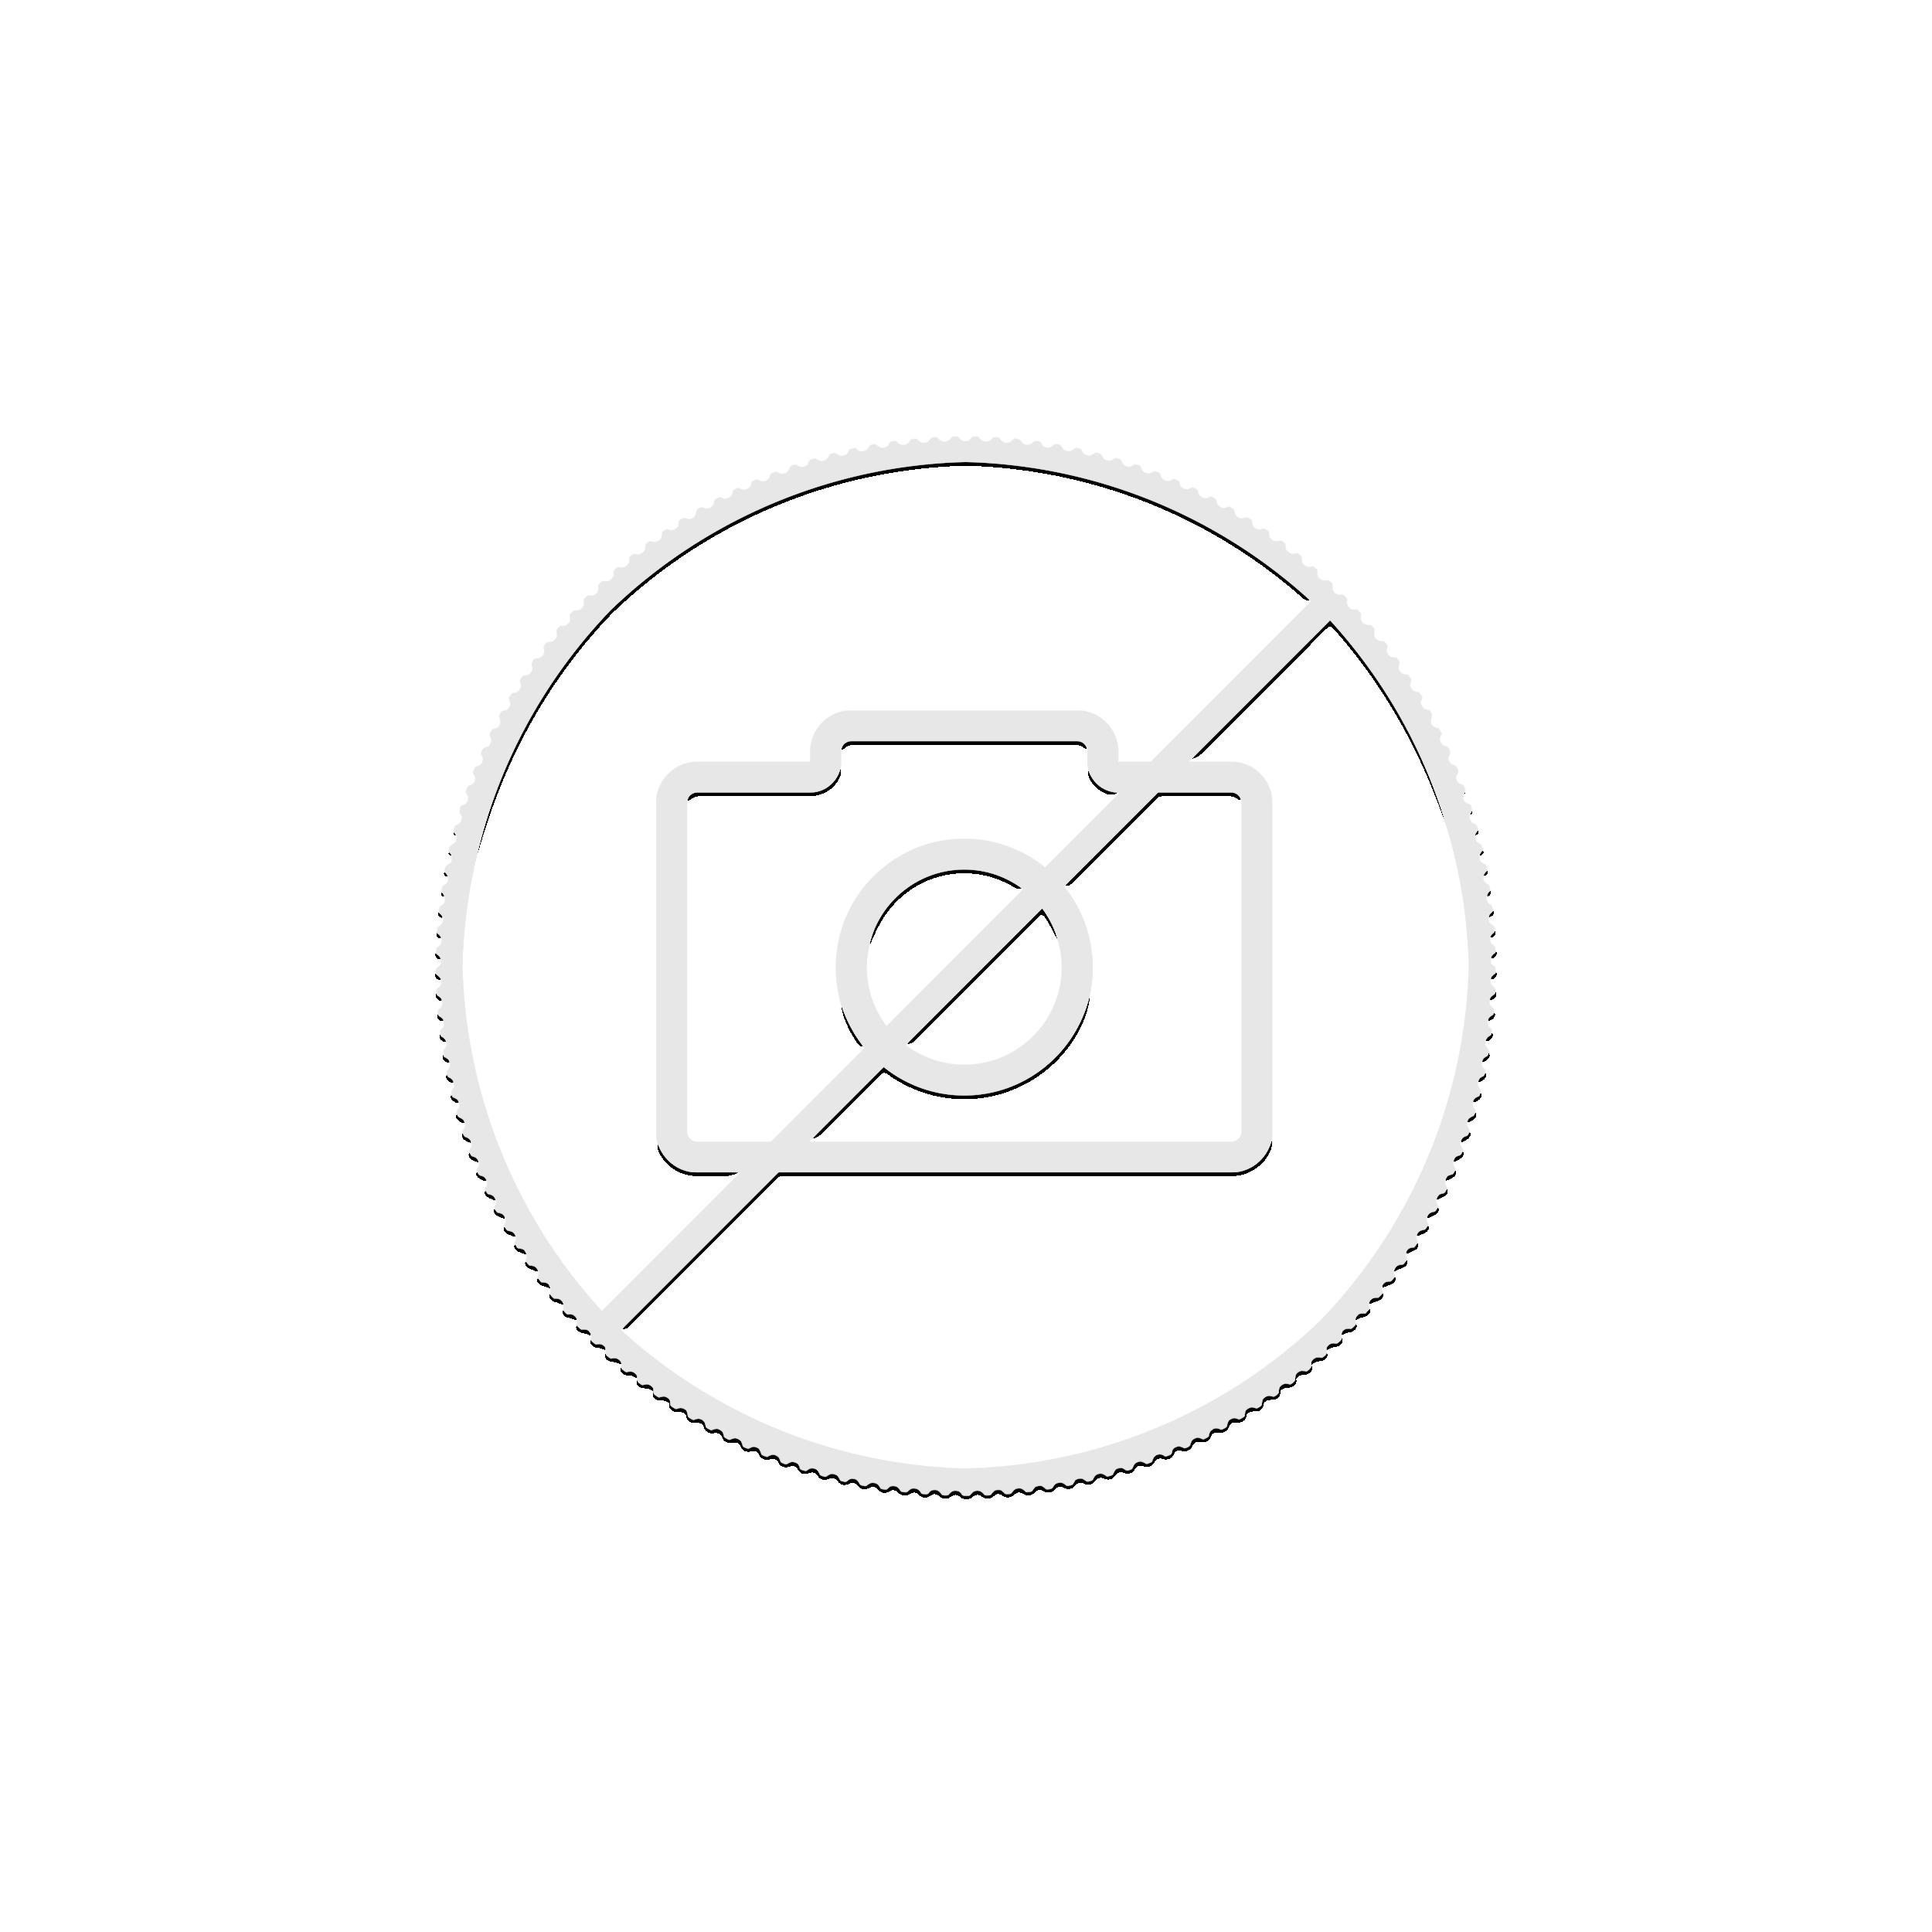 1 Troy ounce zilveren munt Golden Ring - Leopold 2019 achterzijde